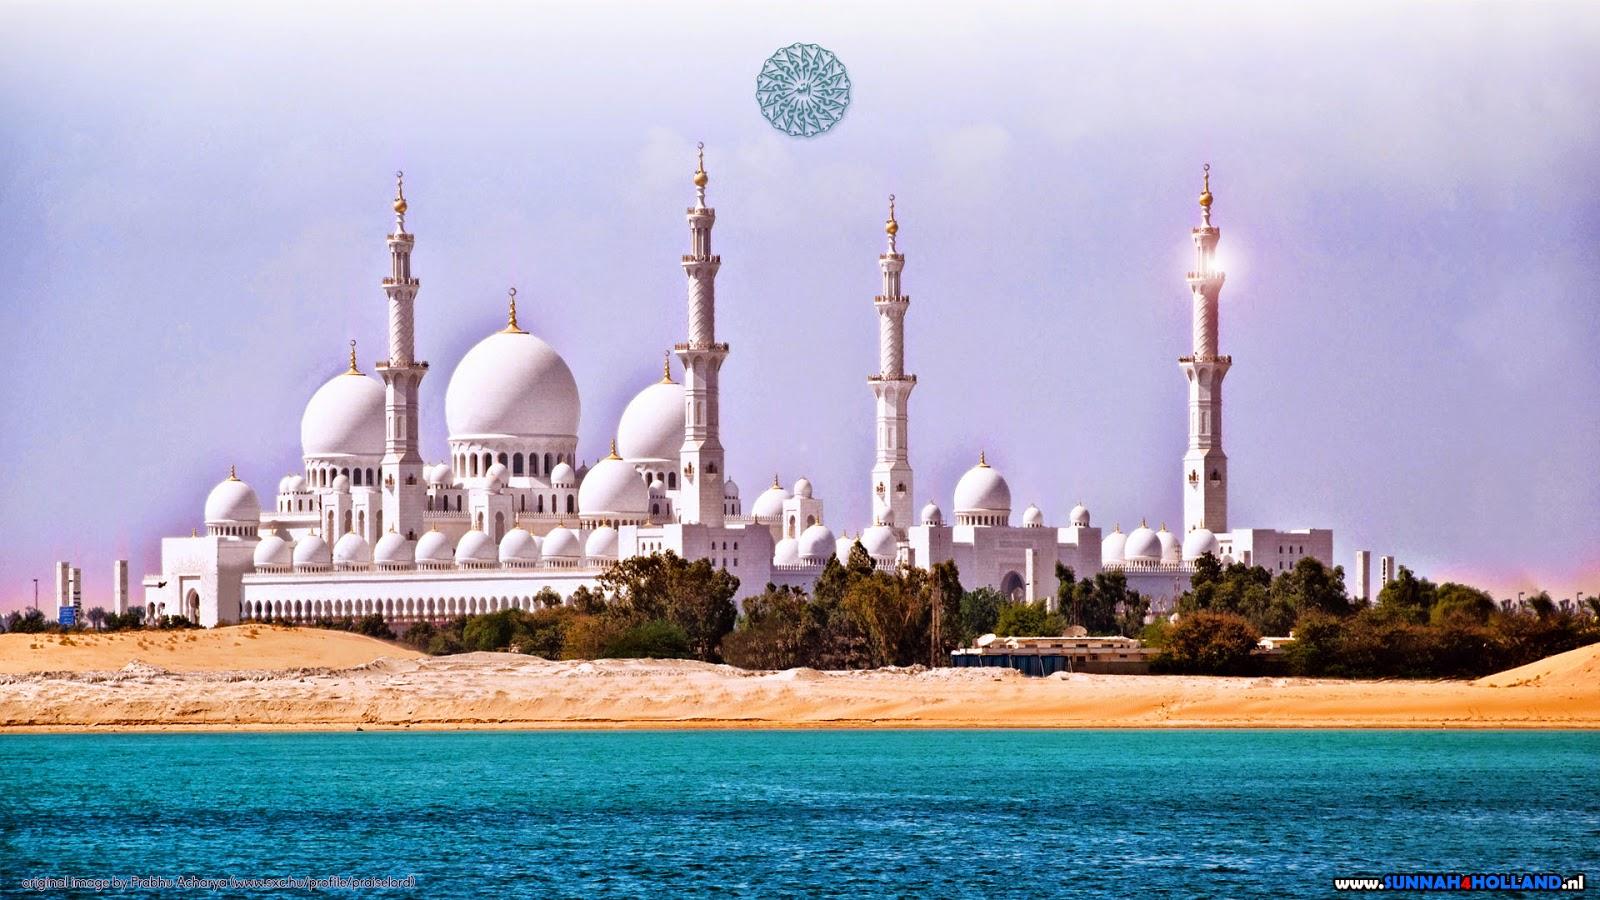 Masjid%2BKeren%2B3%2B %2BKartunlucu.Com